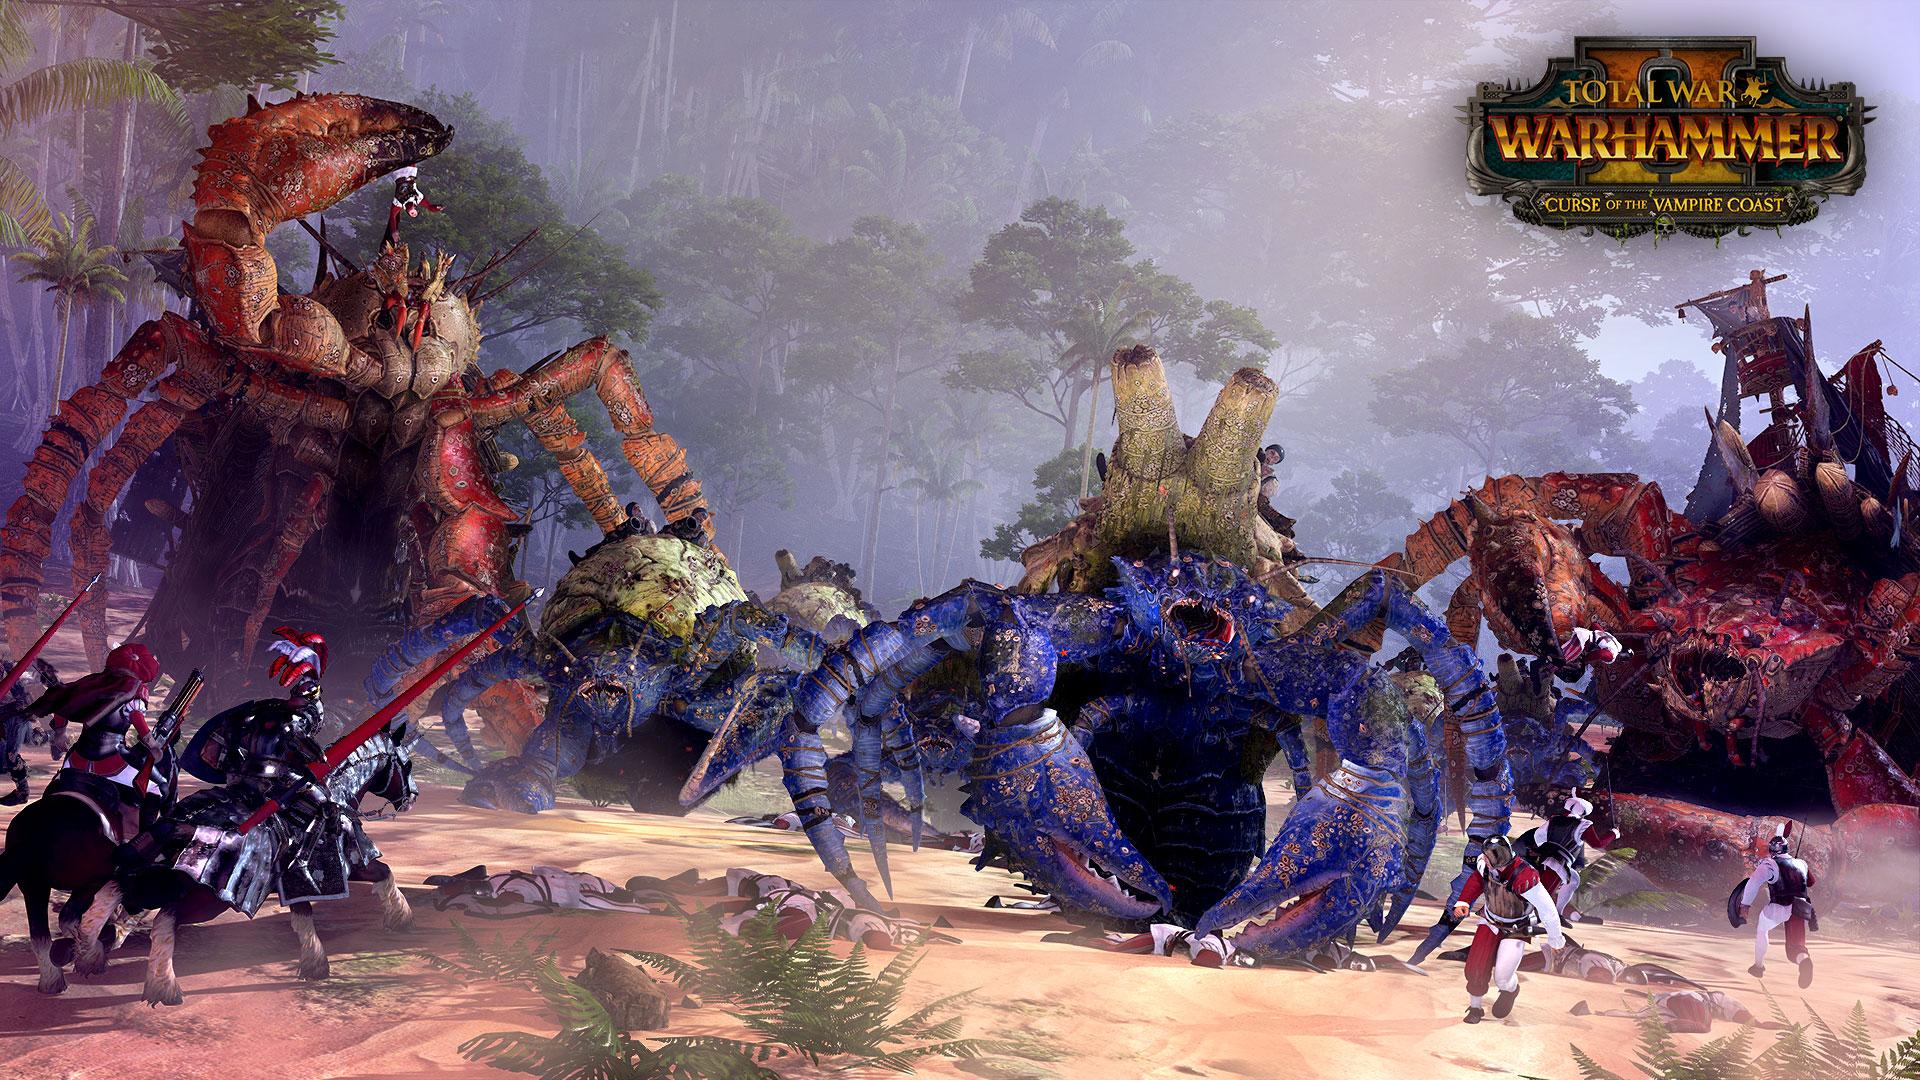 Total War: Warhammer 2 Curse of the Vampire Coast DLC